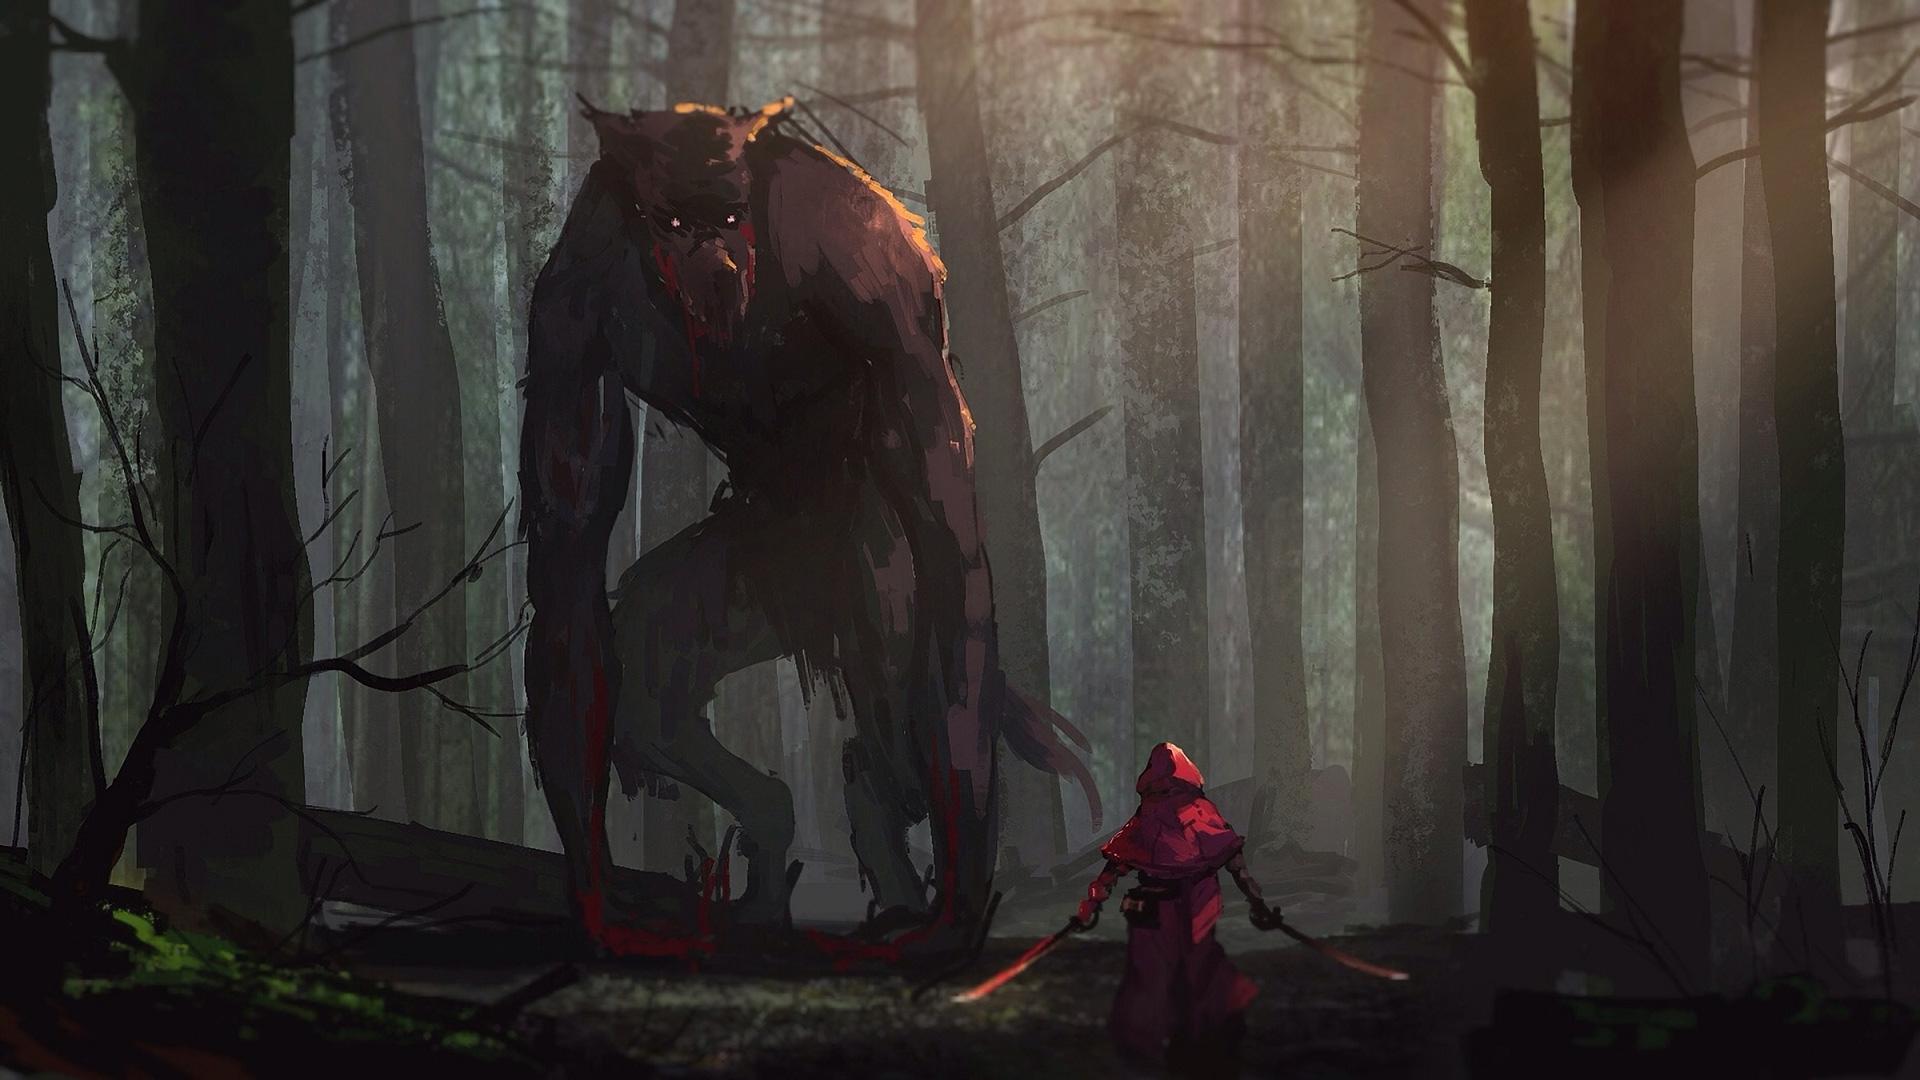 Little Red Riding Hood Vs Werewolves Fairy Tale Artwork